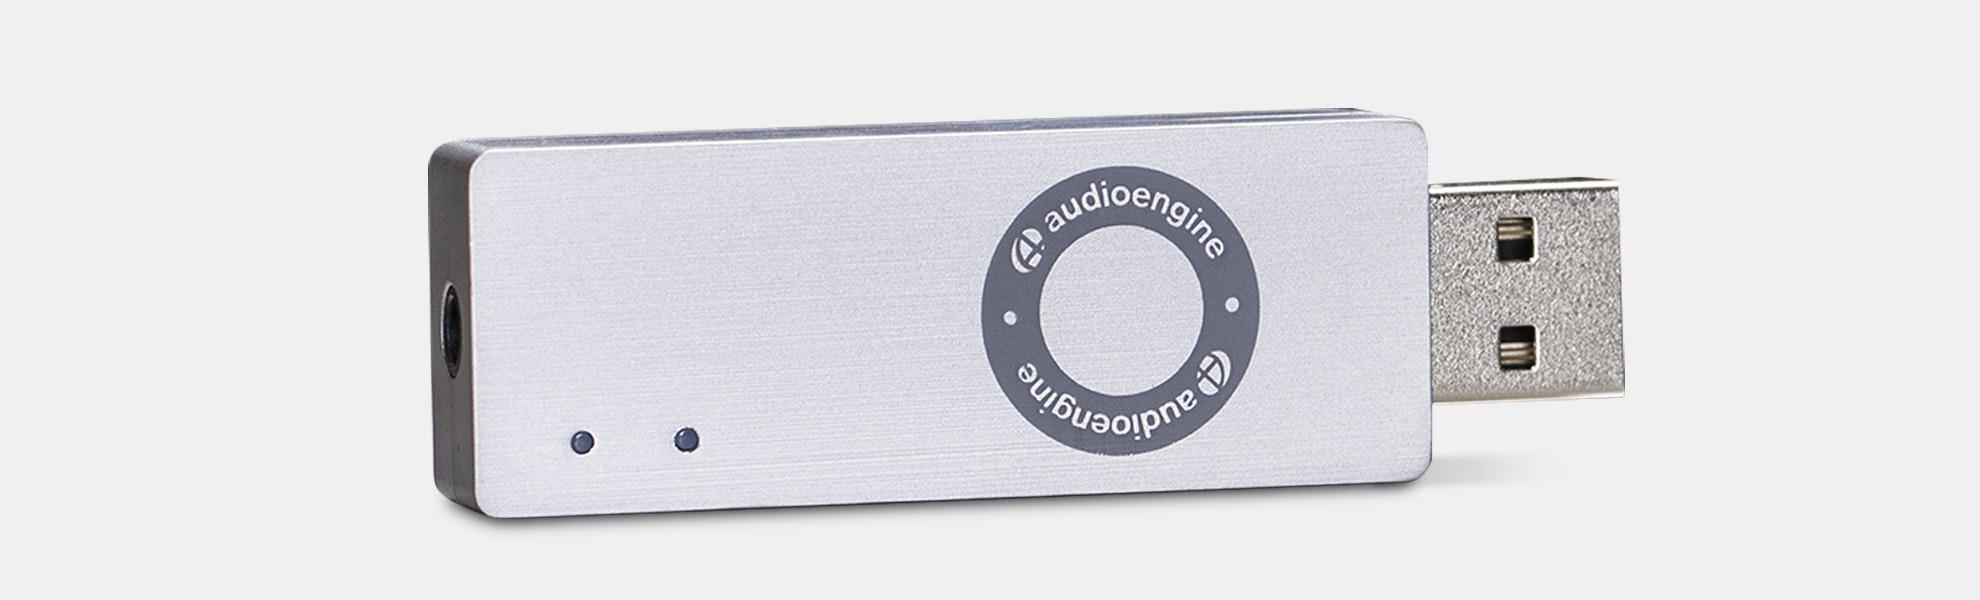 Audioengine D3 Portable DAC/Amp